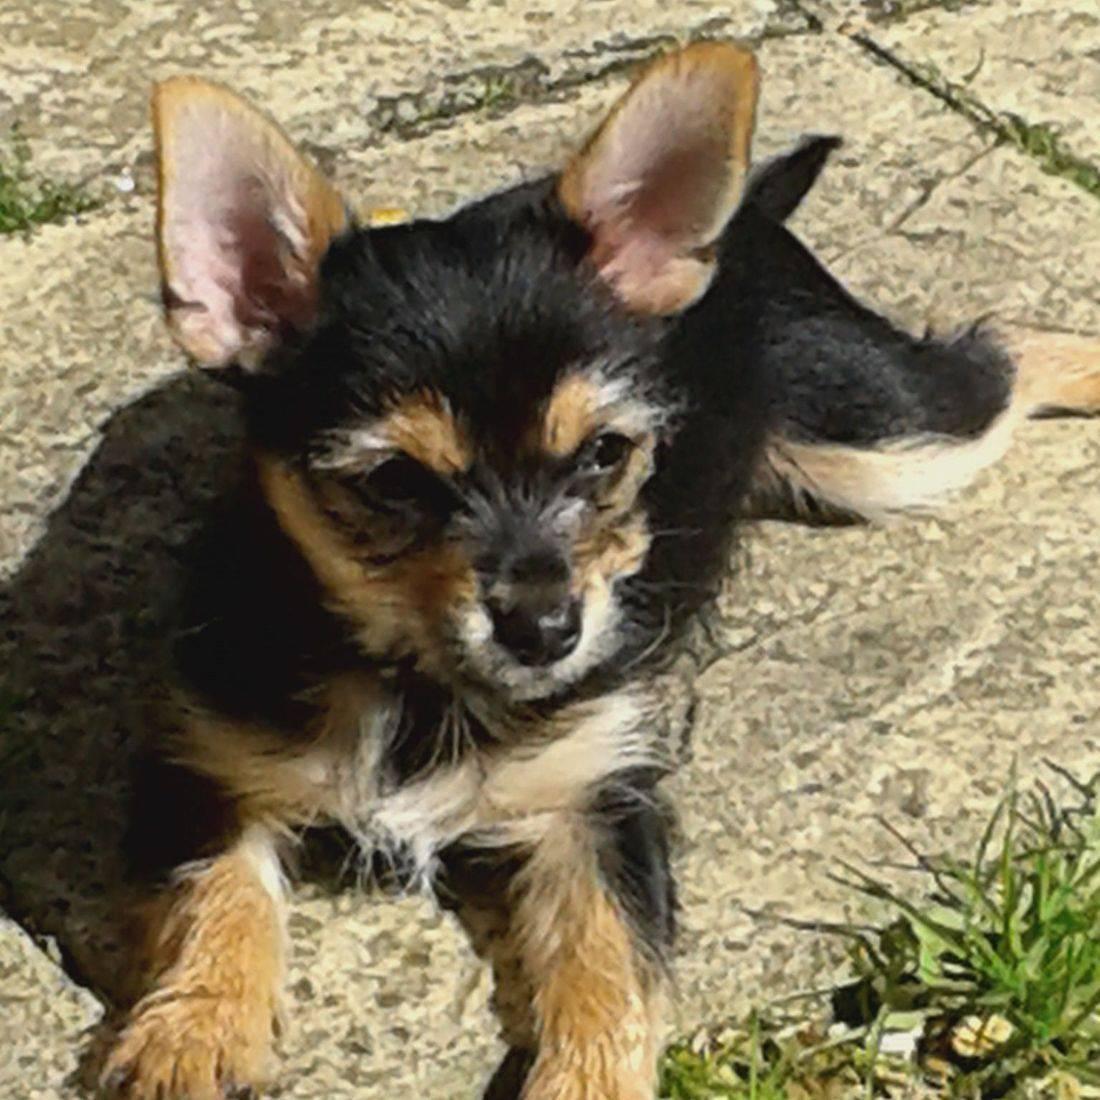 Cute puppy with big ears sunbathing